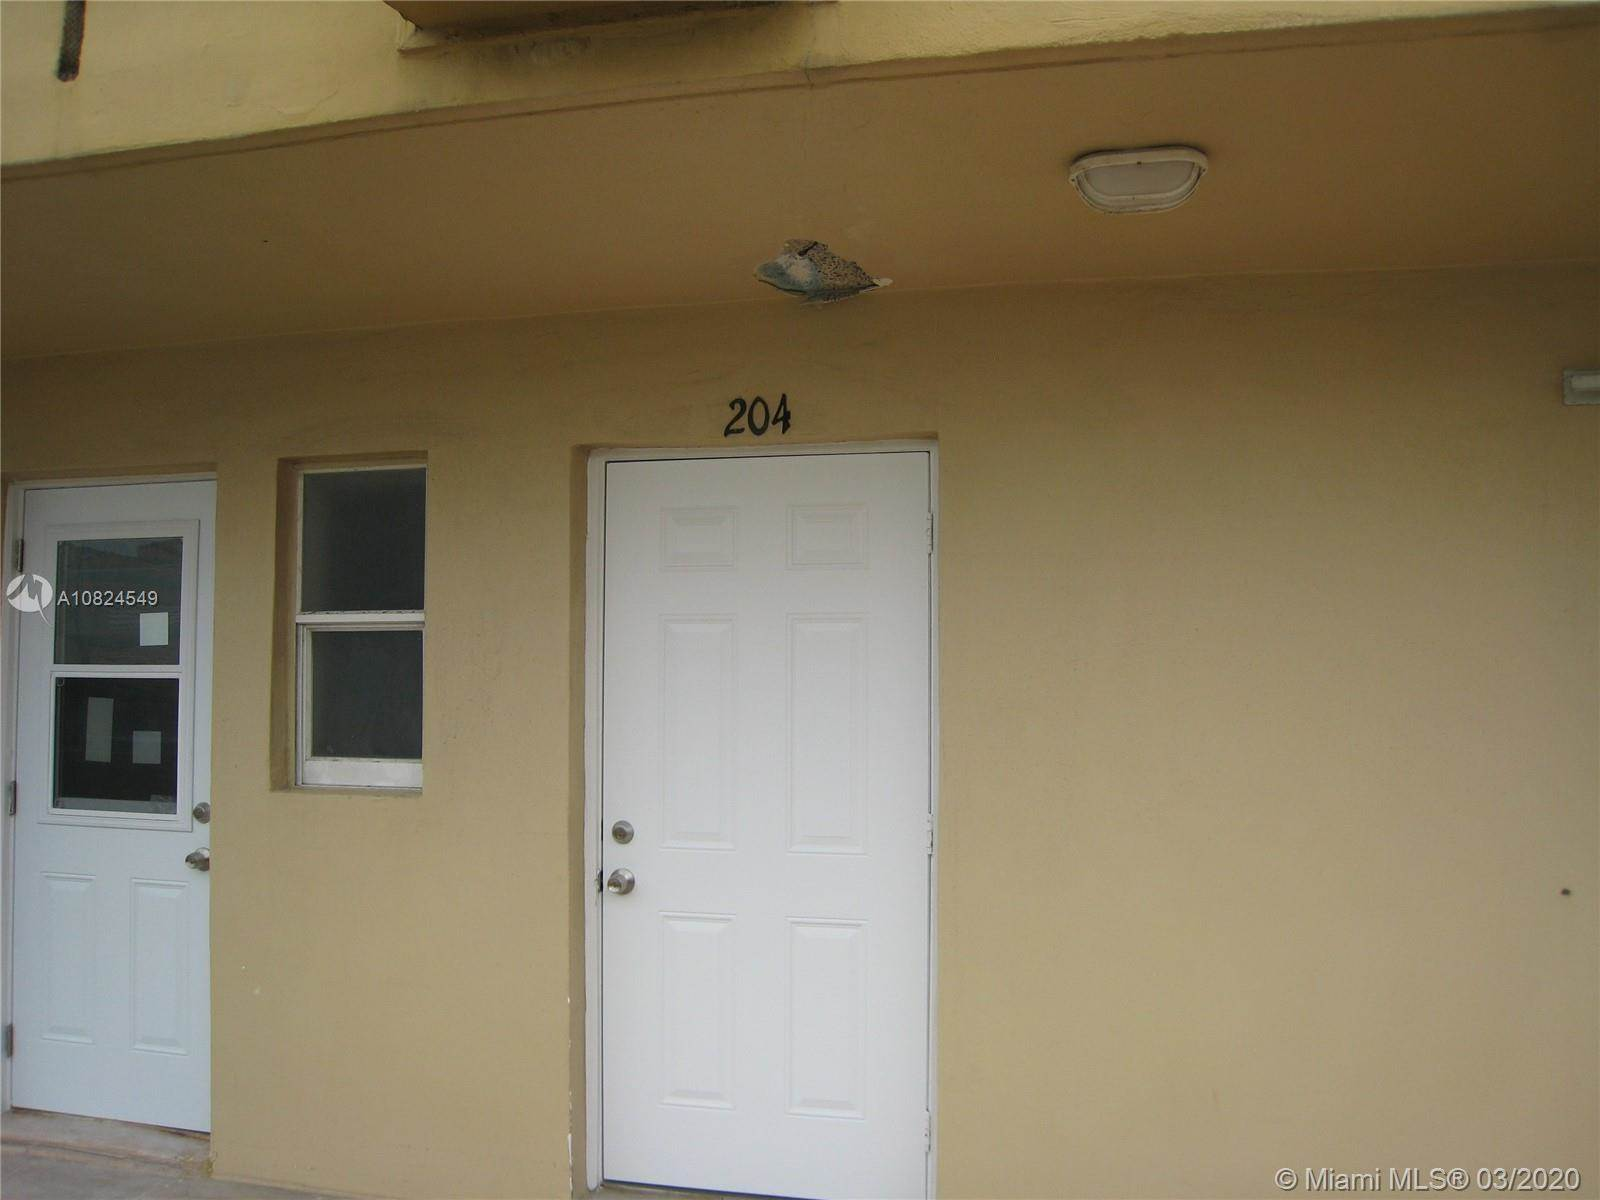 320 South Surf Rd, #204, Hollywood, FL 33019